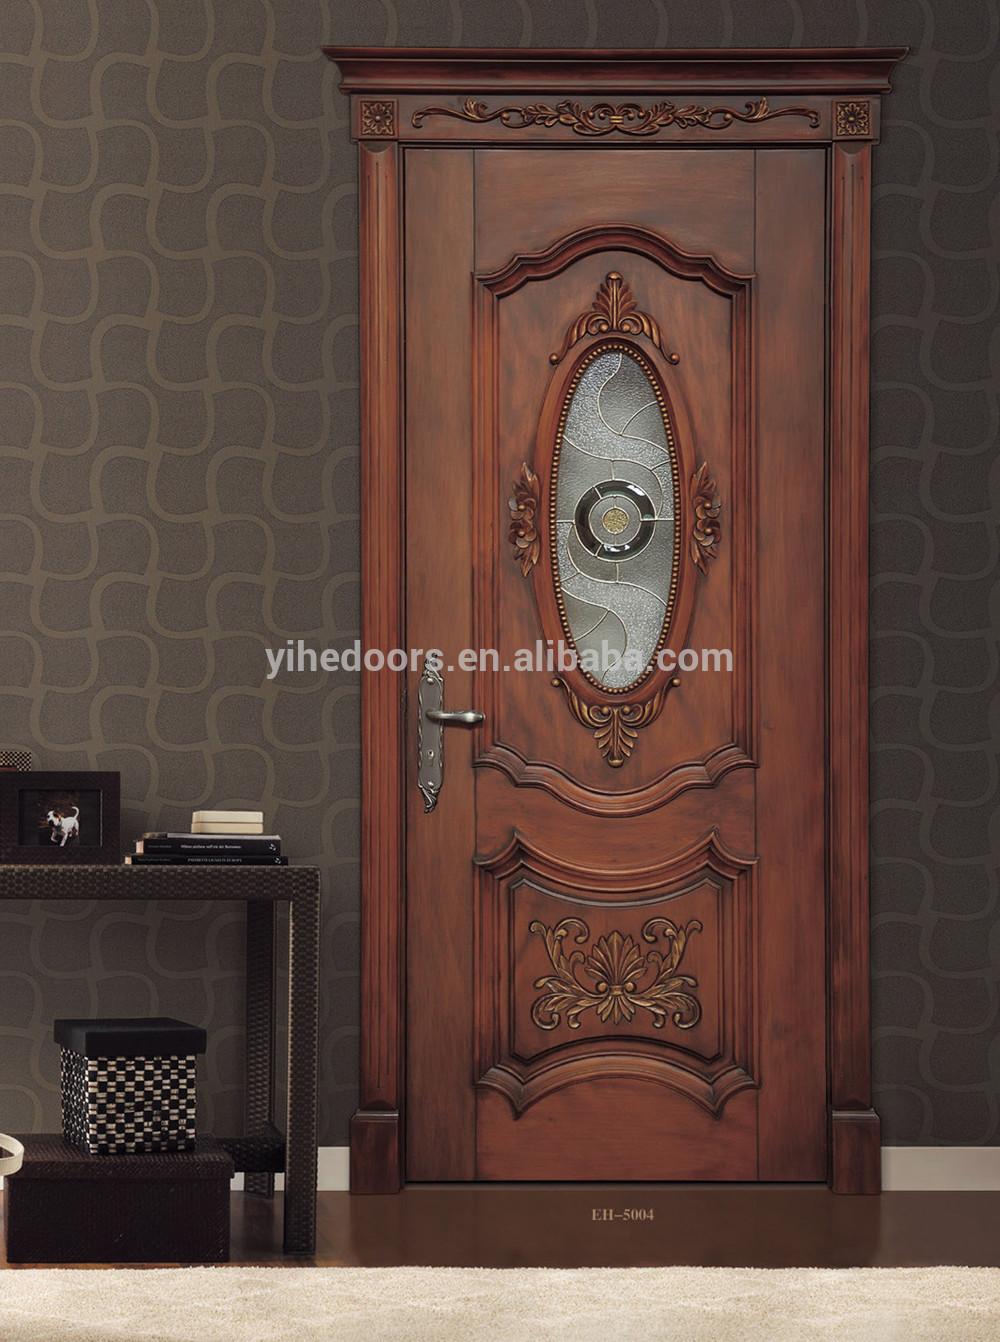 Wooden single door designs for houses images for Single main door designs for houses